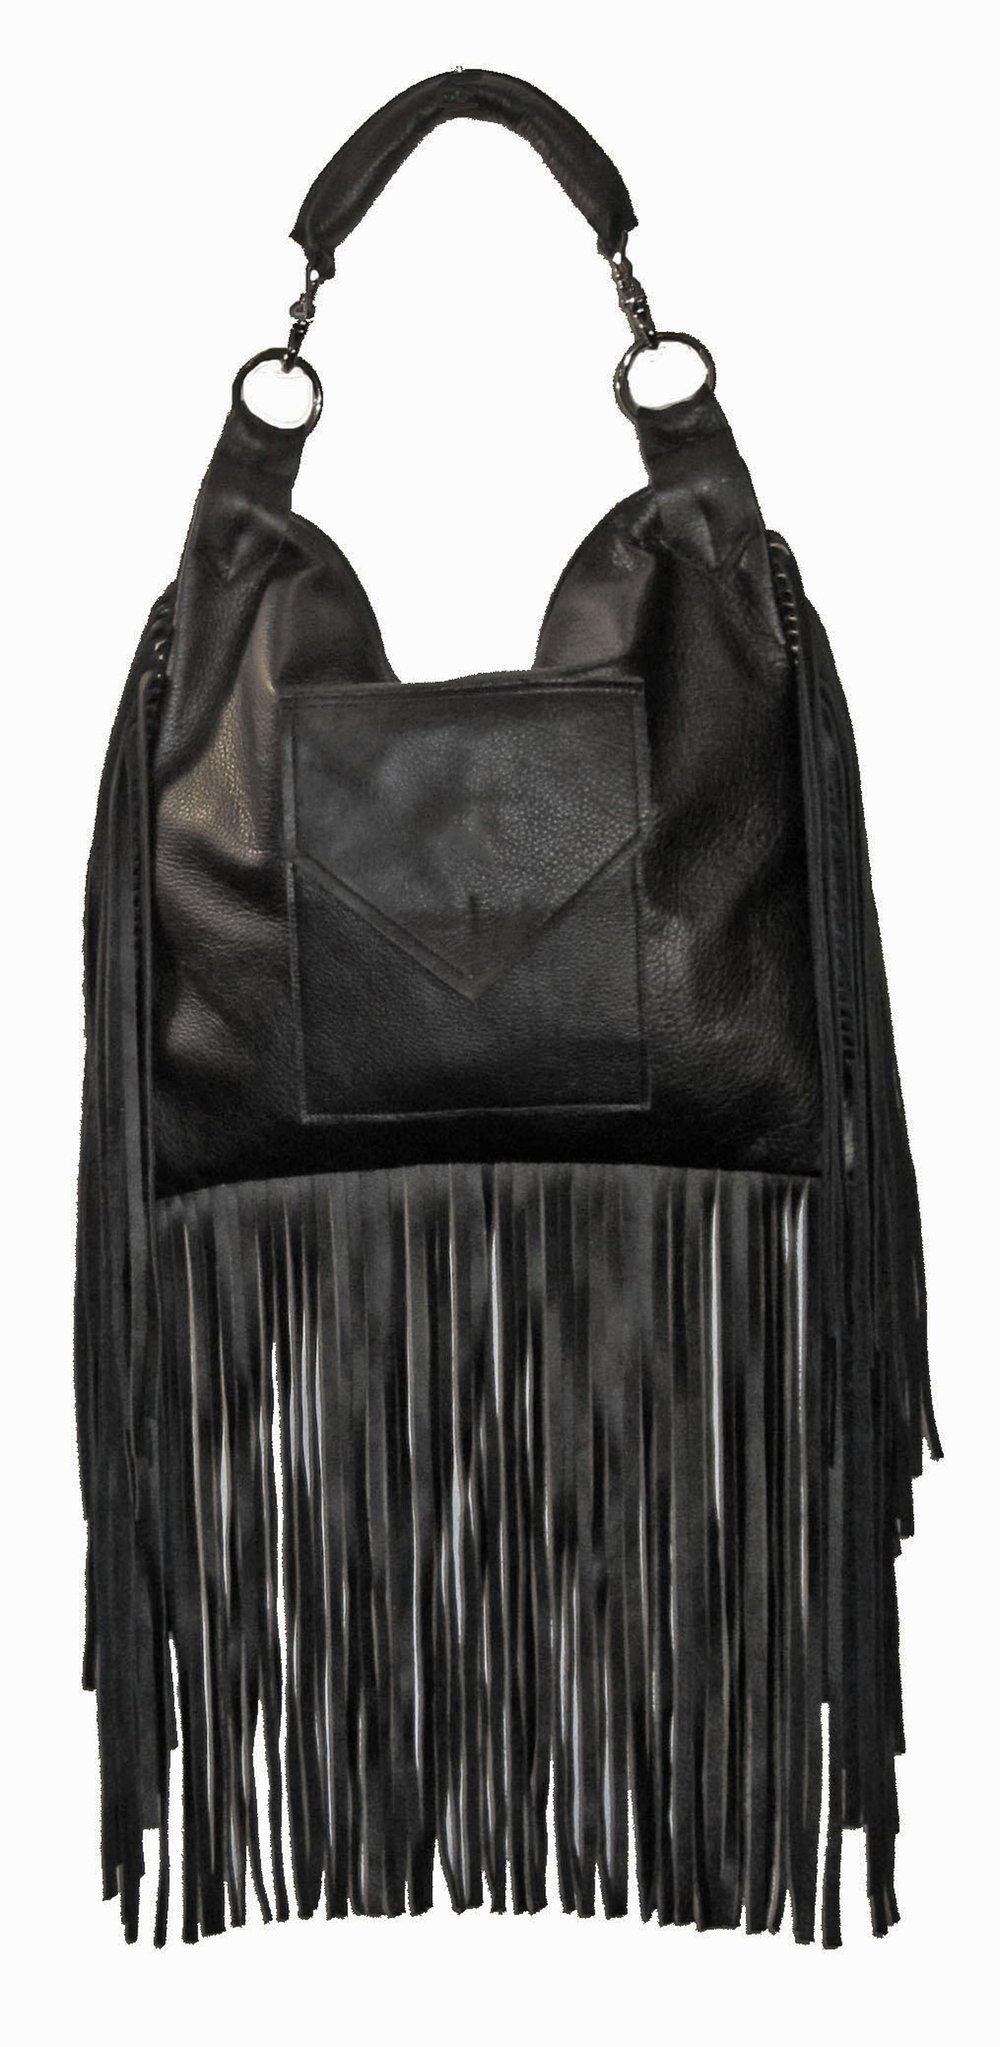 Image of Freebird Fringed Bag- Recycled Leather or Vegan